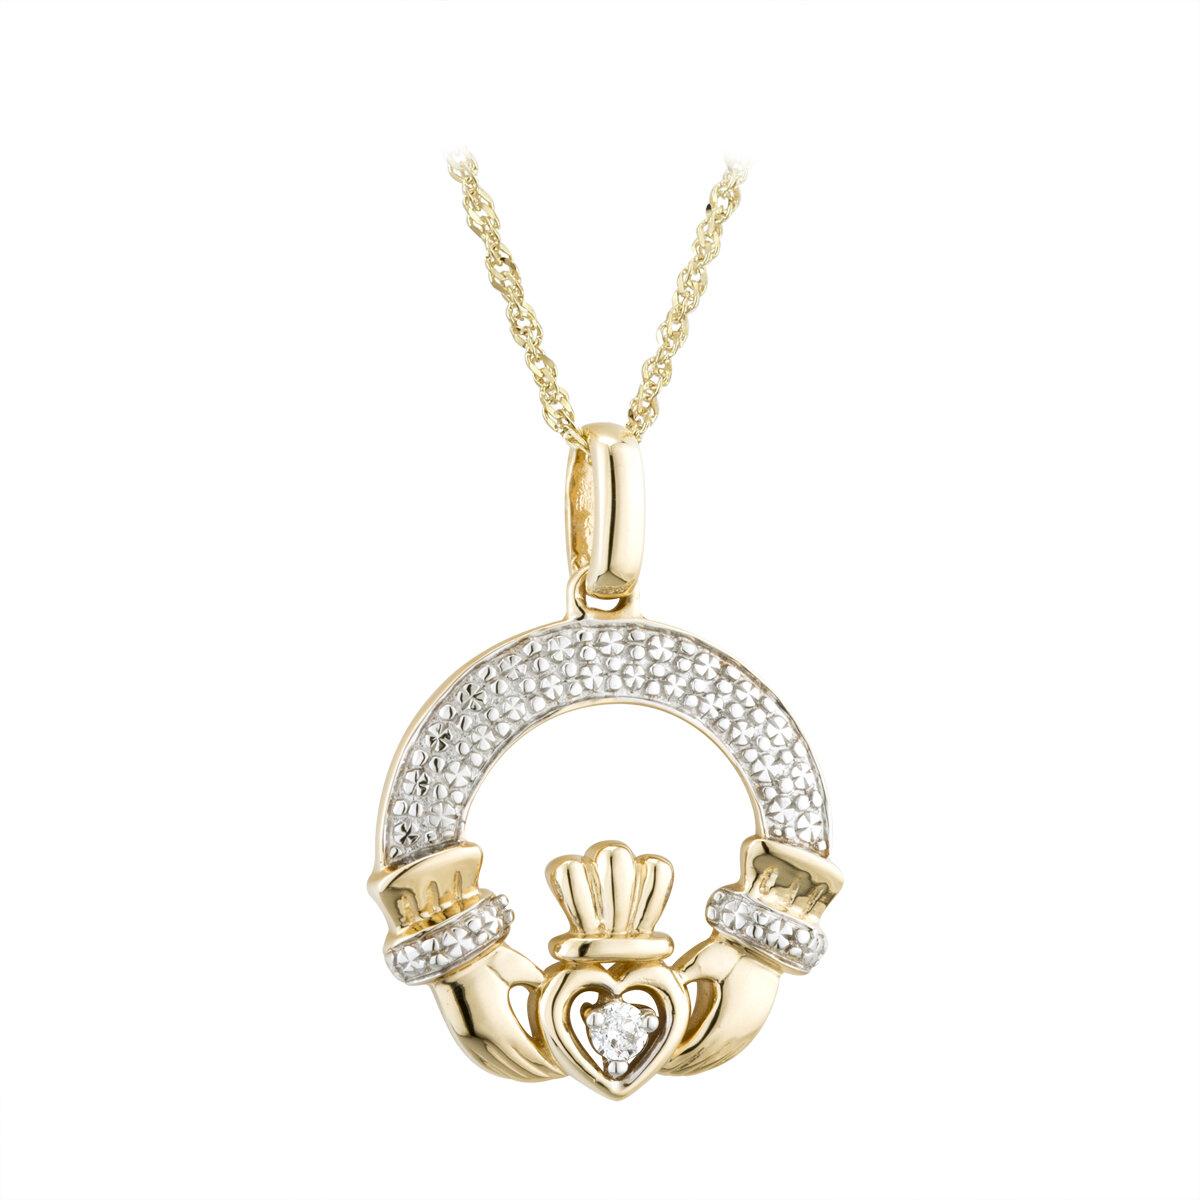 14k gold diamond irish claddagh necklace s45602 from Solvar